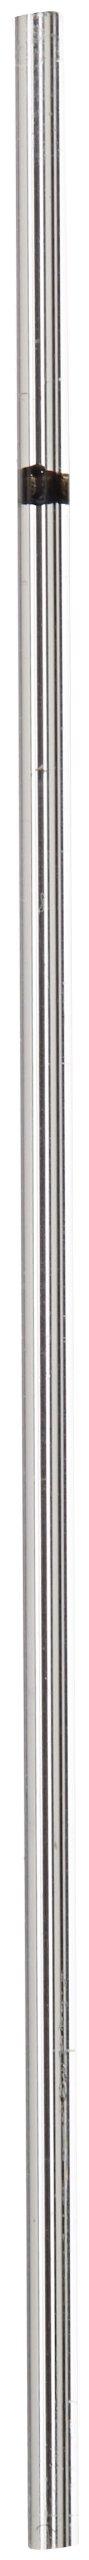 Kimble 40C505 Soda Lime Glass Micro Hematocrit Capillary Tube, Heparinized, 60mm Calibration (Case of 1200)